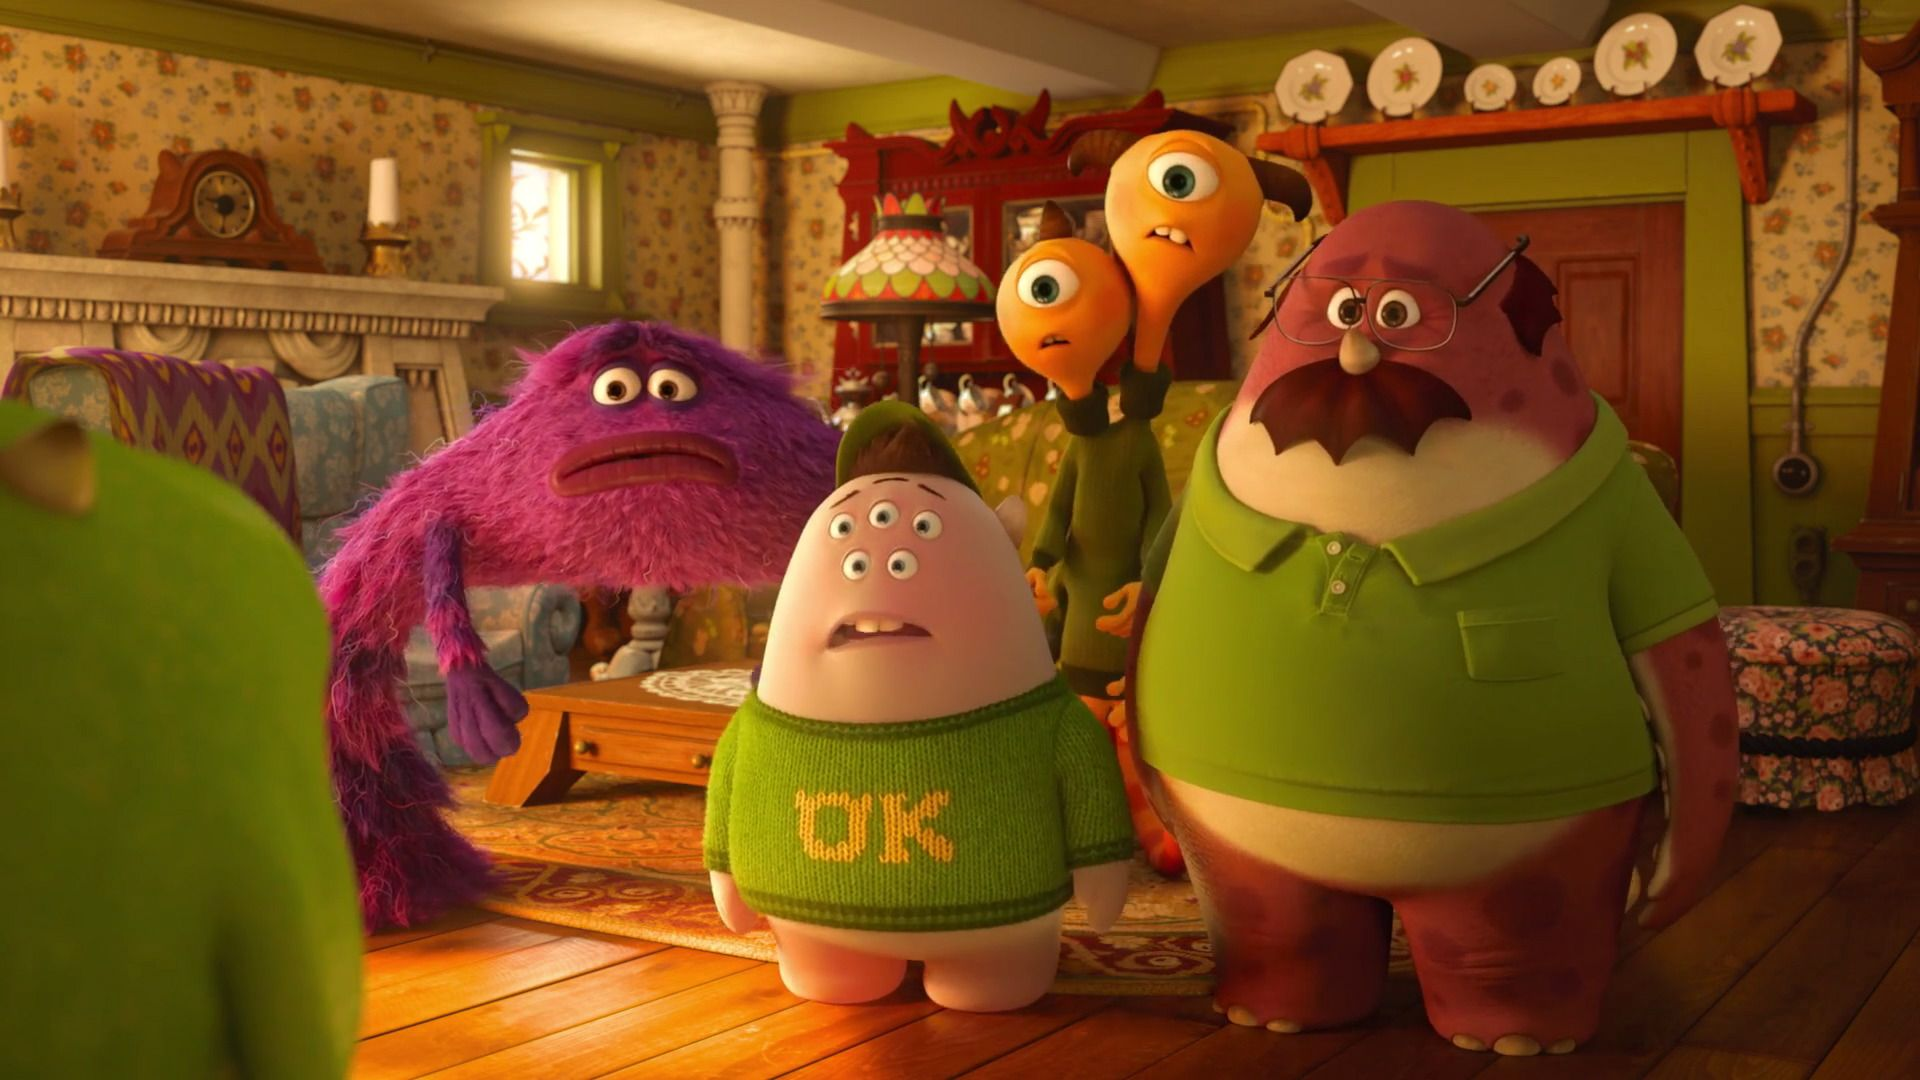 Screencap Gallery For Monsters University 2013 1080p Bluray Disney Sequels Monsters Inc Pixar Mike Wazowski Monster University Mike And Sulley Monster